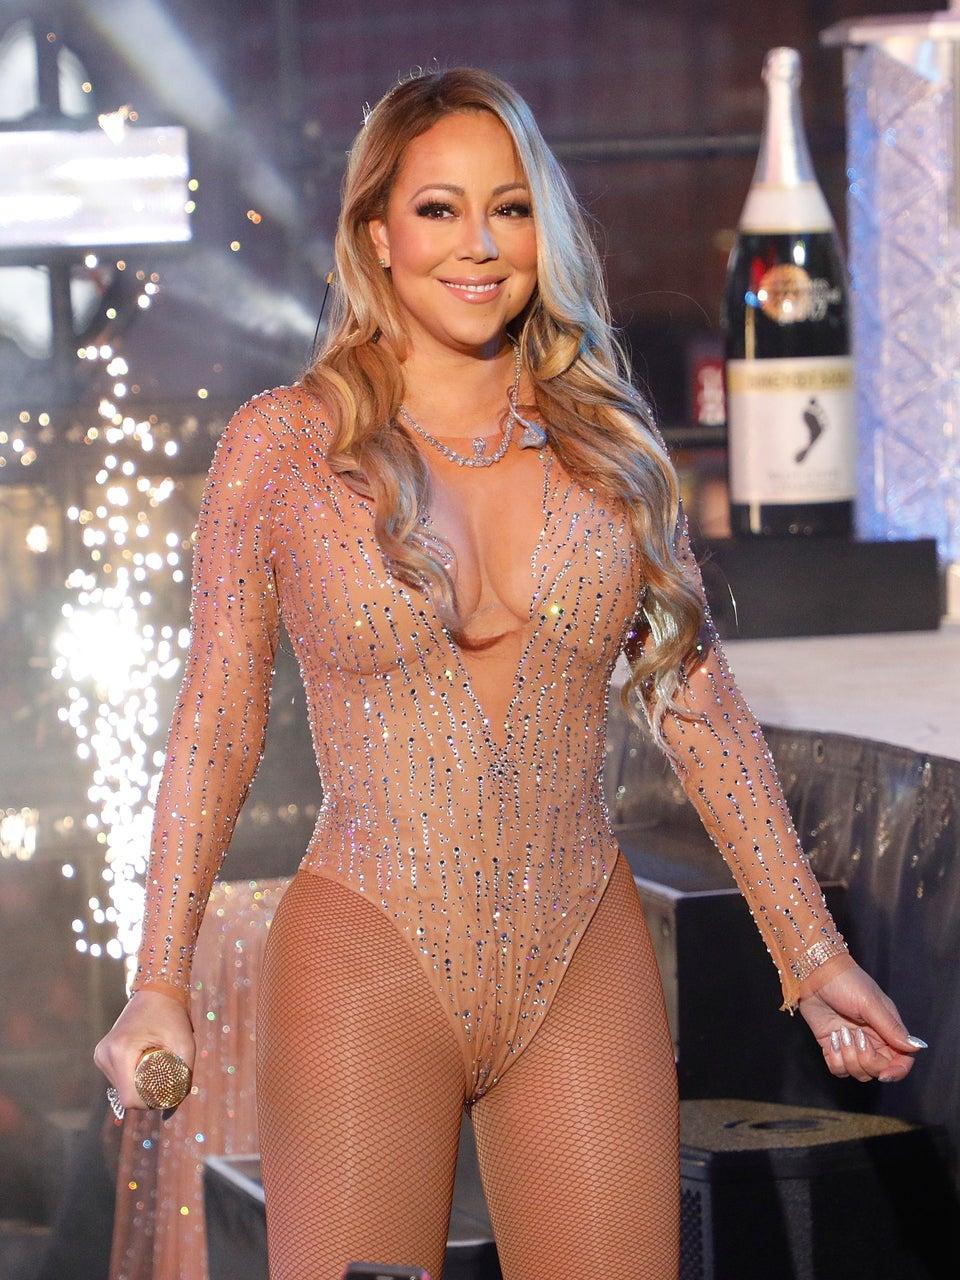 Hello Kitty: Mariah Carey Makes Her 'Empire' Debut